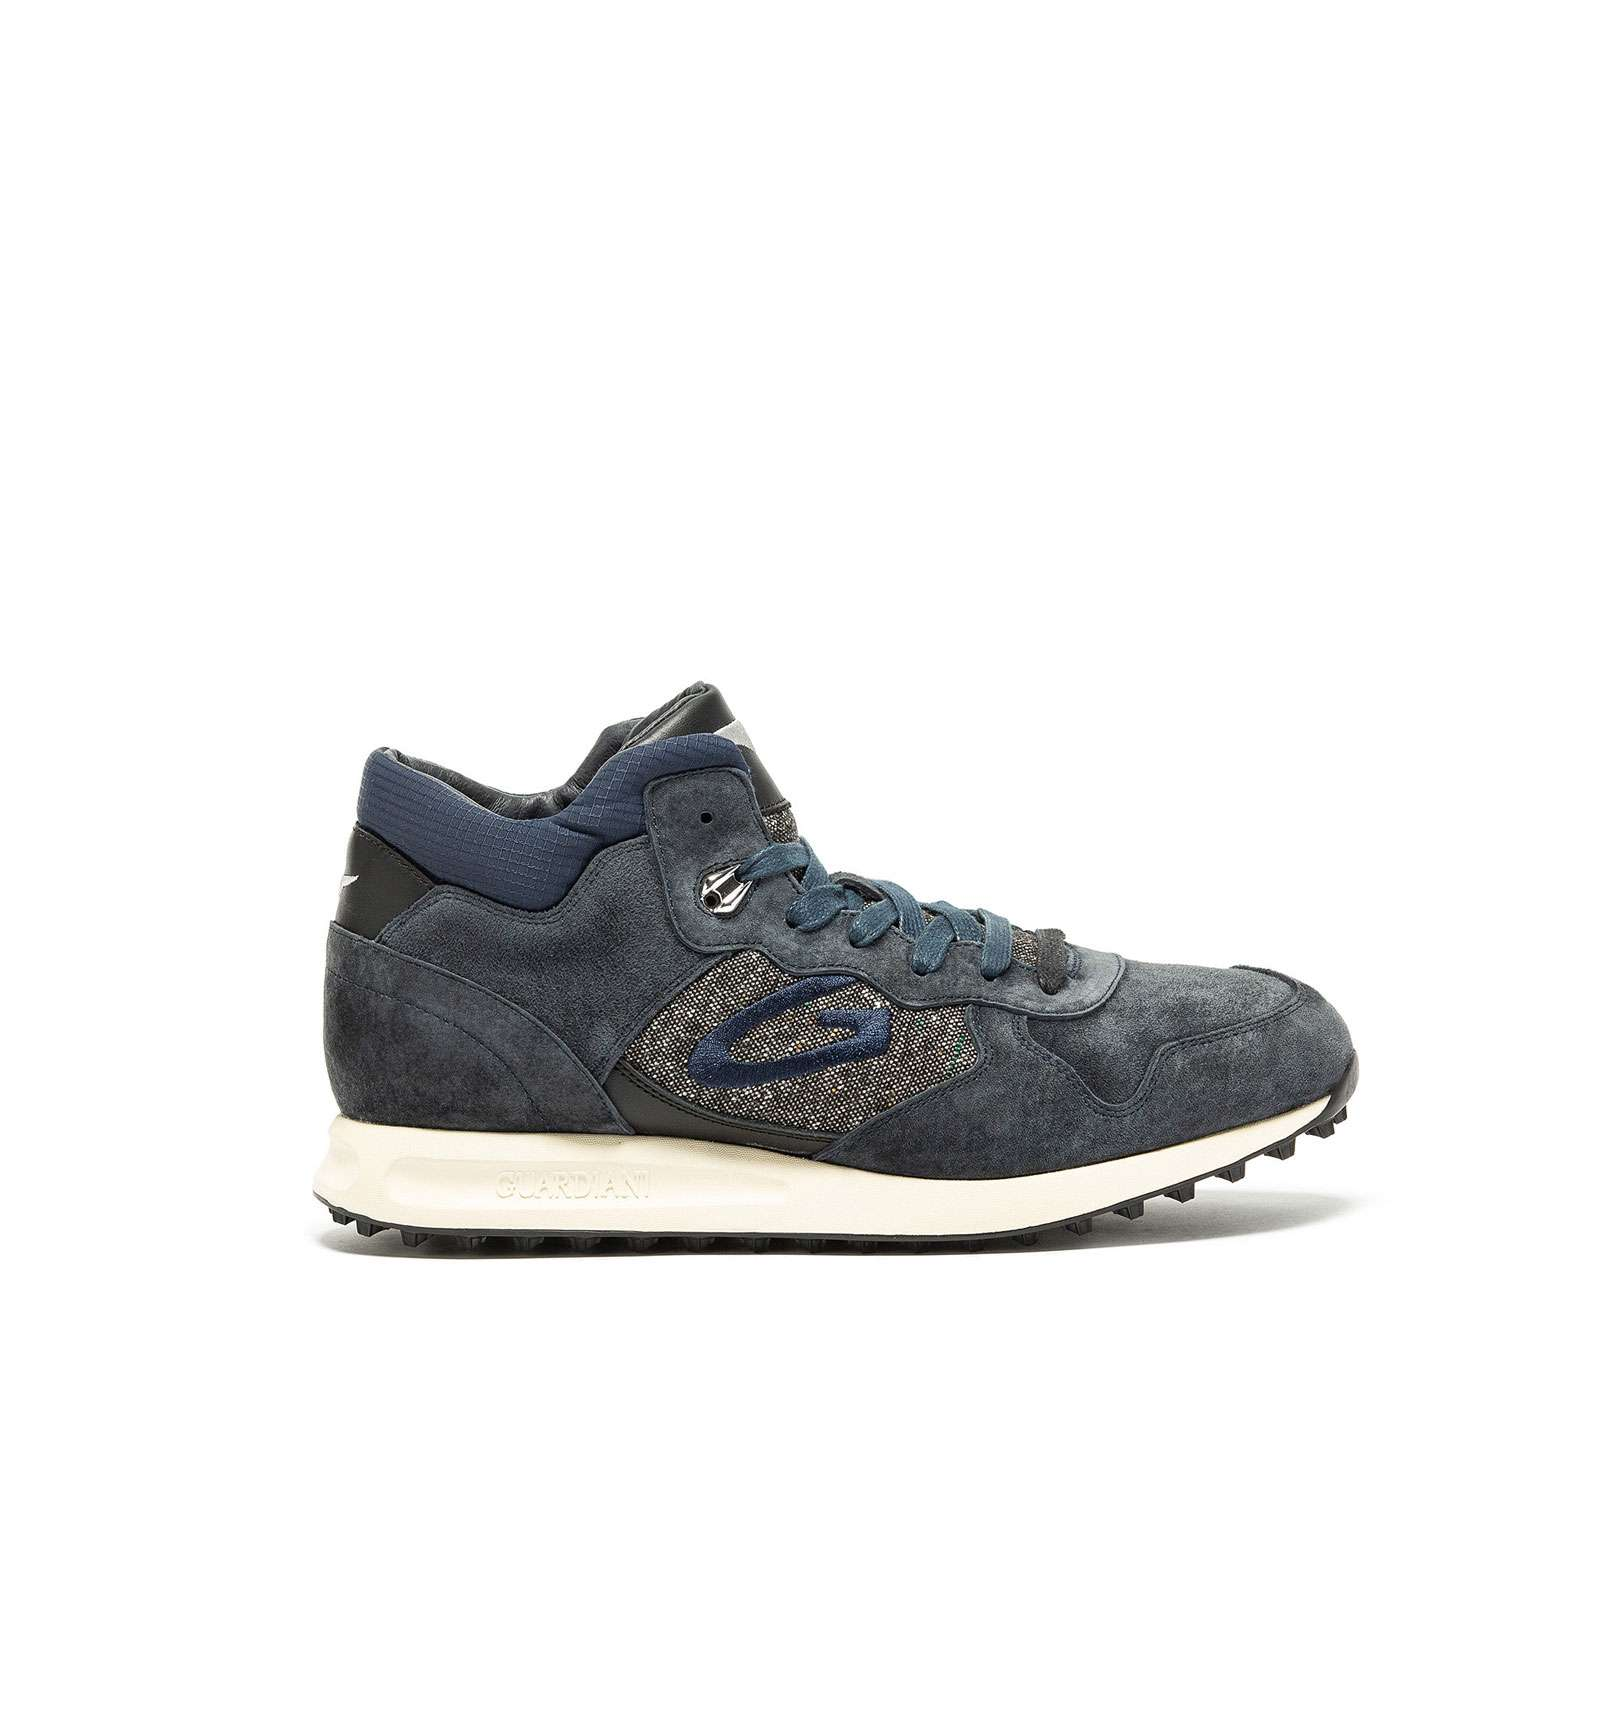 Calzature Sneaker Guardiani Armenise Nino Alberto FqnHw8X